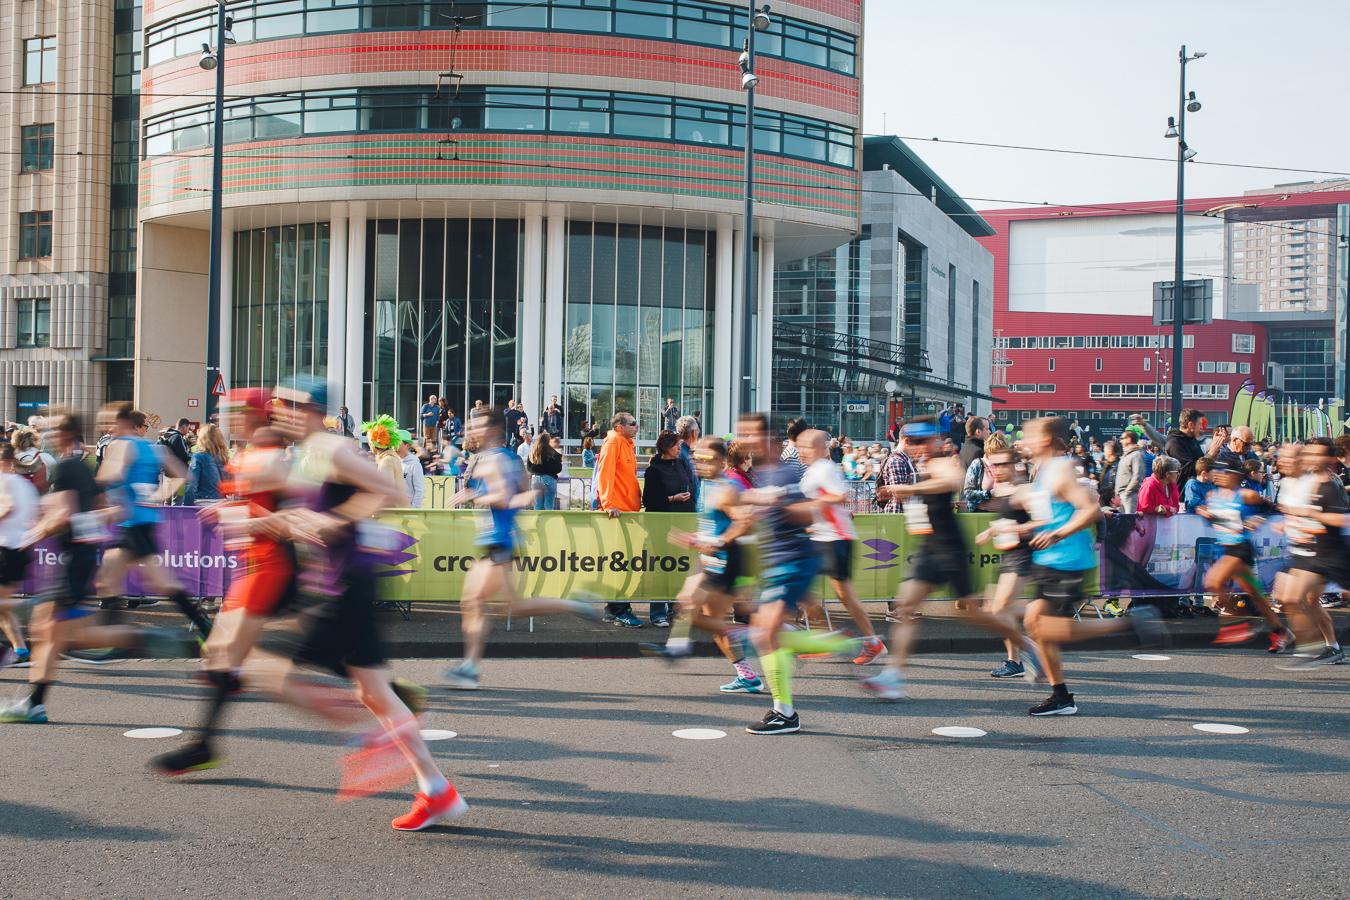 TBI tijdens Marathon Rotterdam 2019 hardlopers rennen langs banners